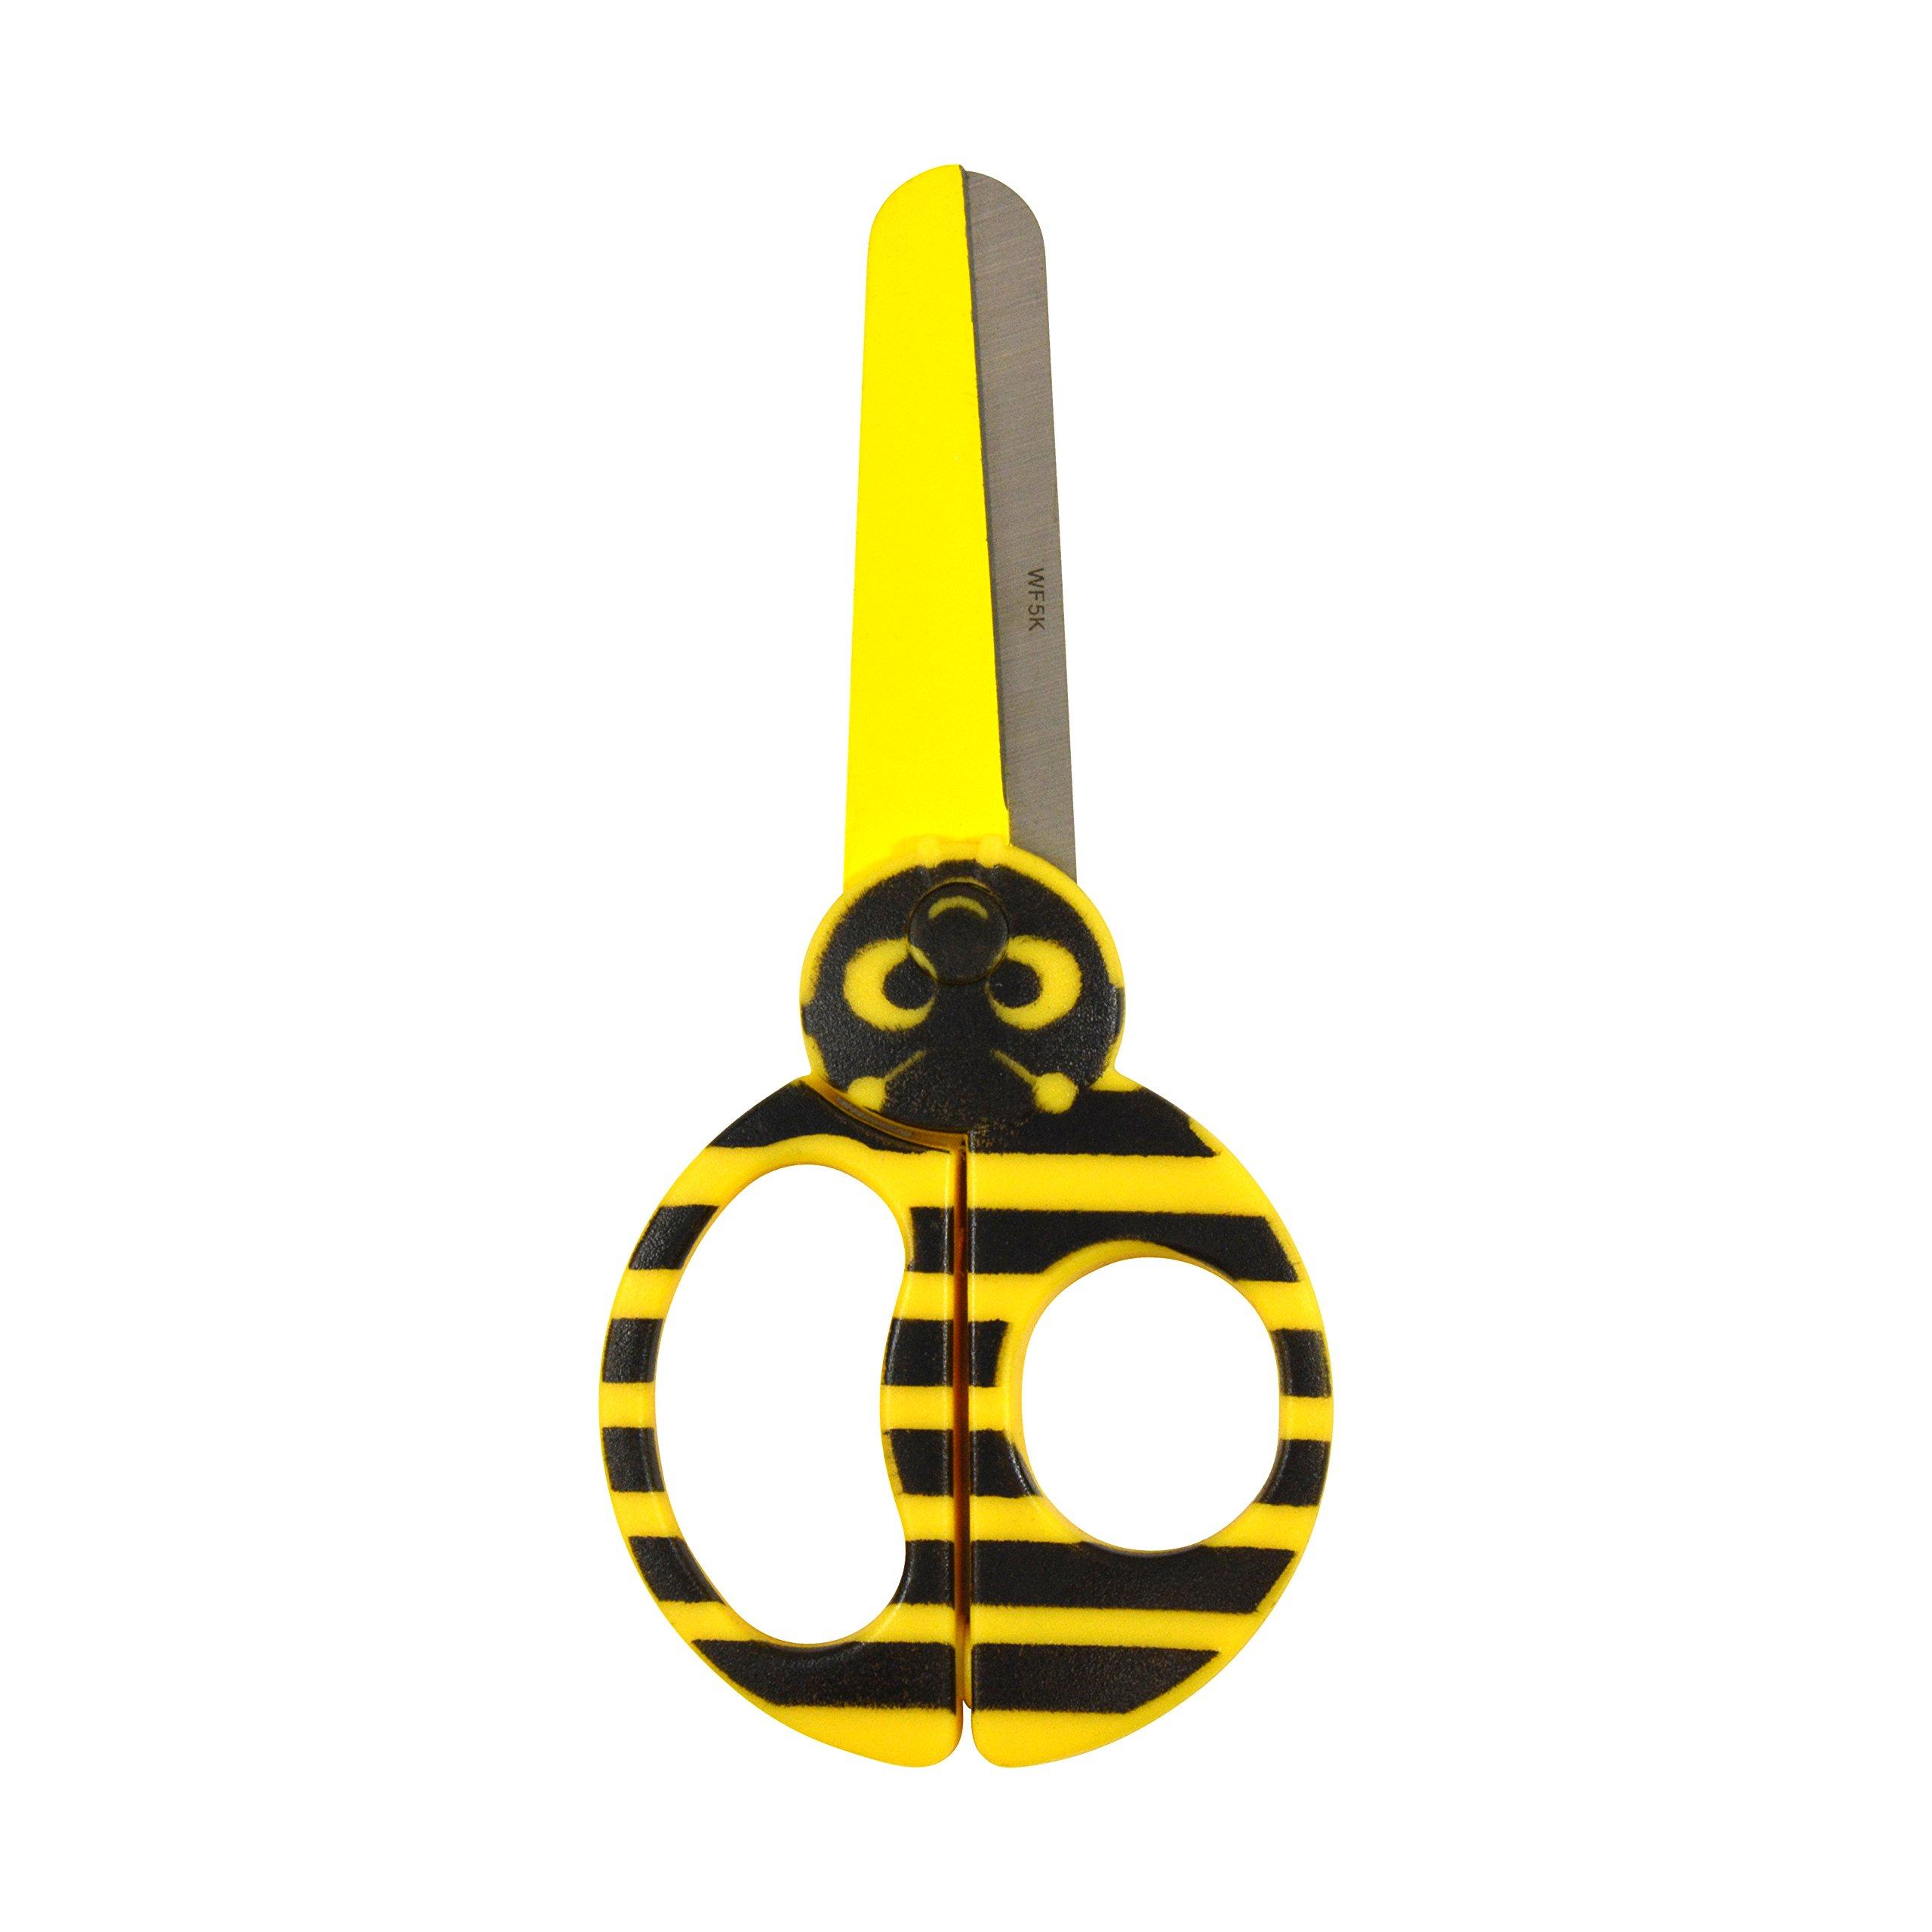 Westcott Kids Critters Scissors, Bumble Bee, Case of 72 (500-16208) - 5''